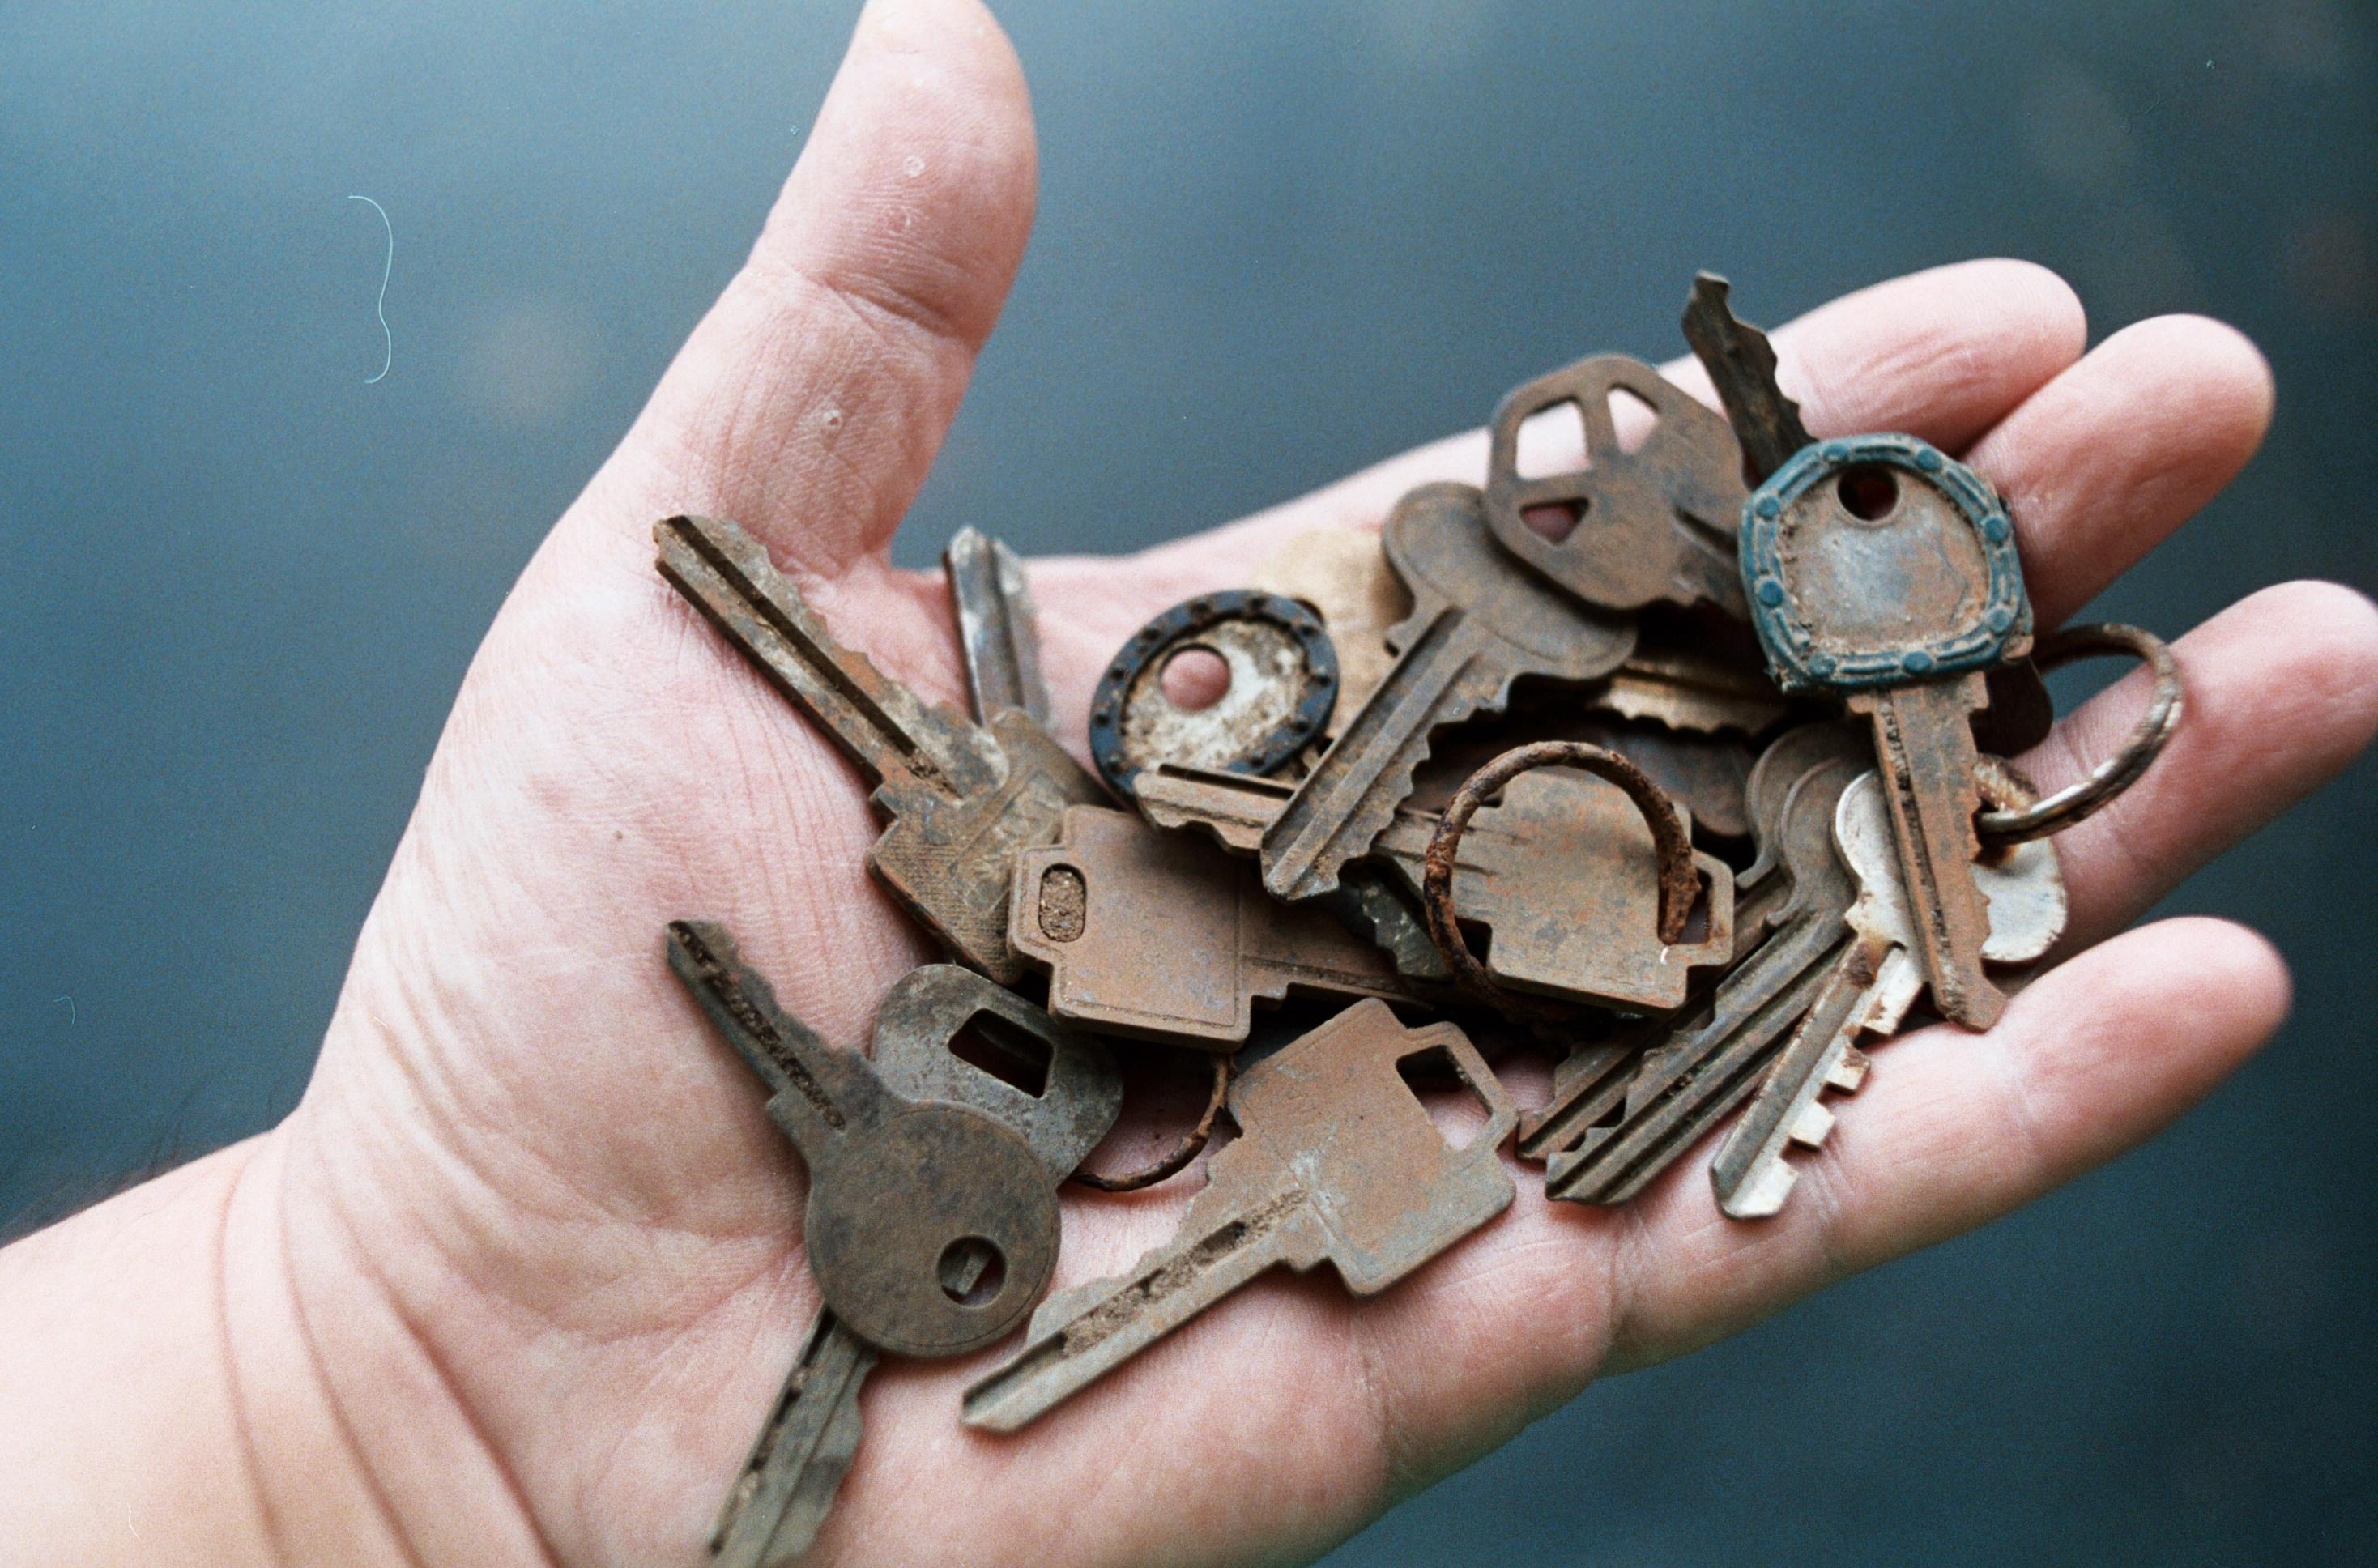 Free Images : hand, film, rust, brown, 35mm, keys, lost